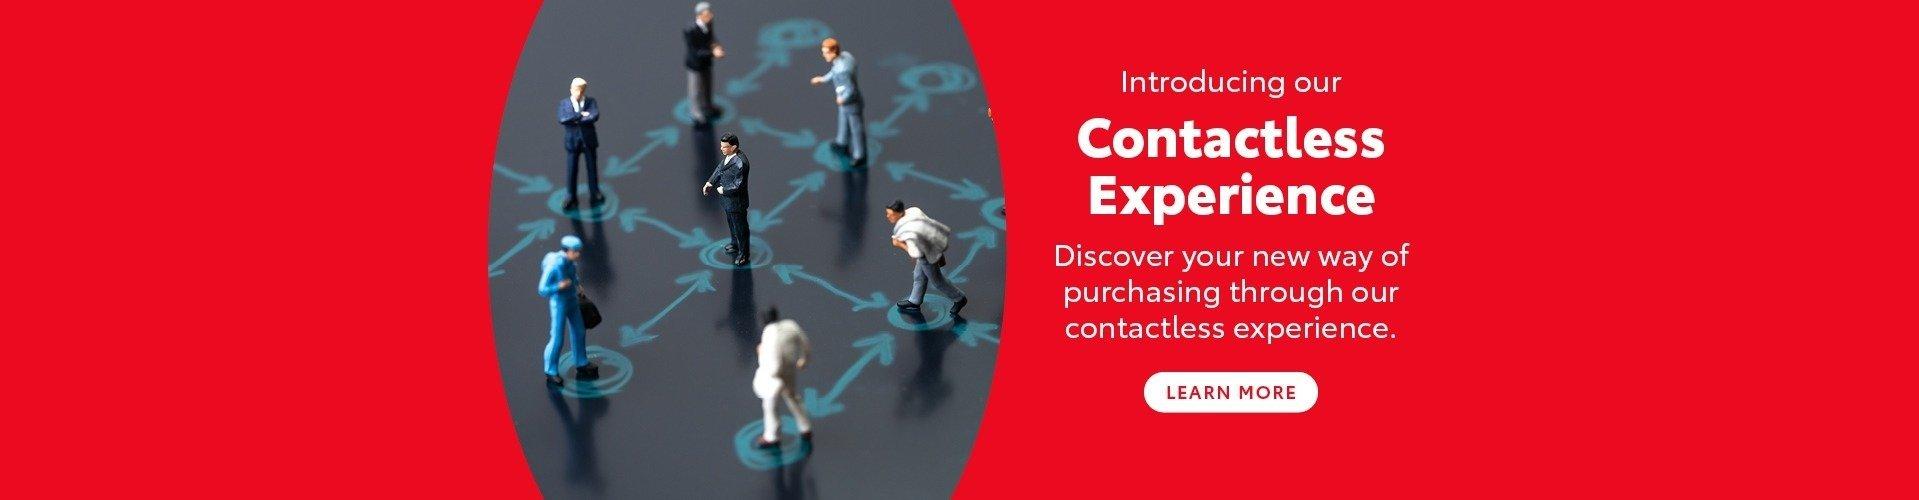 Contacless Experience - Croydon Toyota